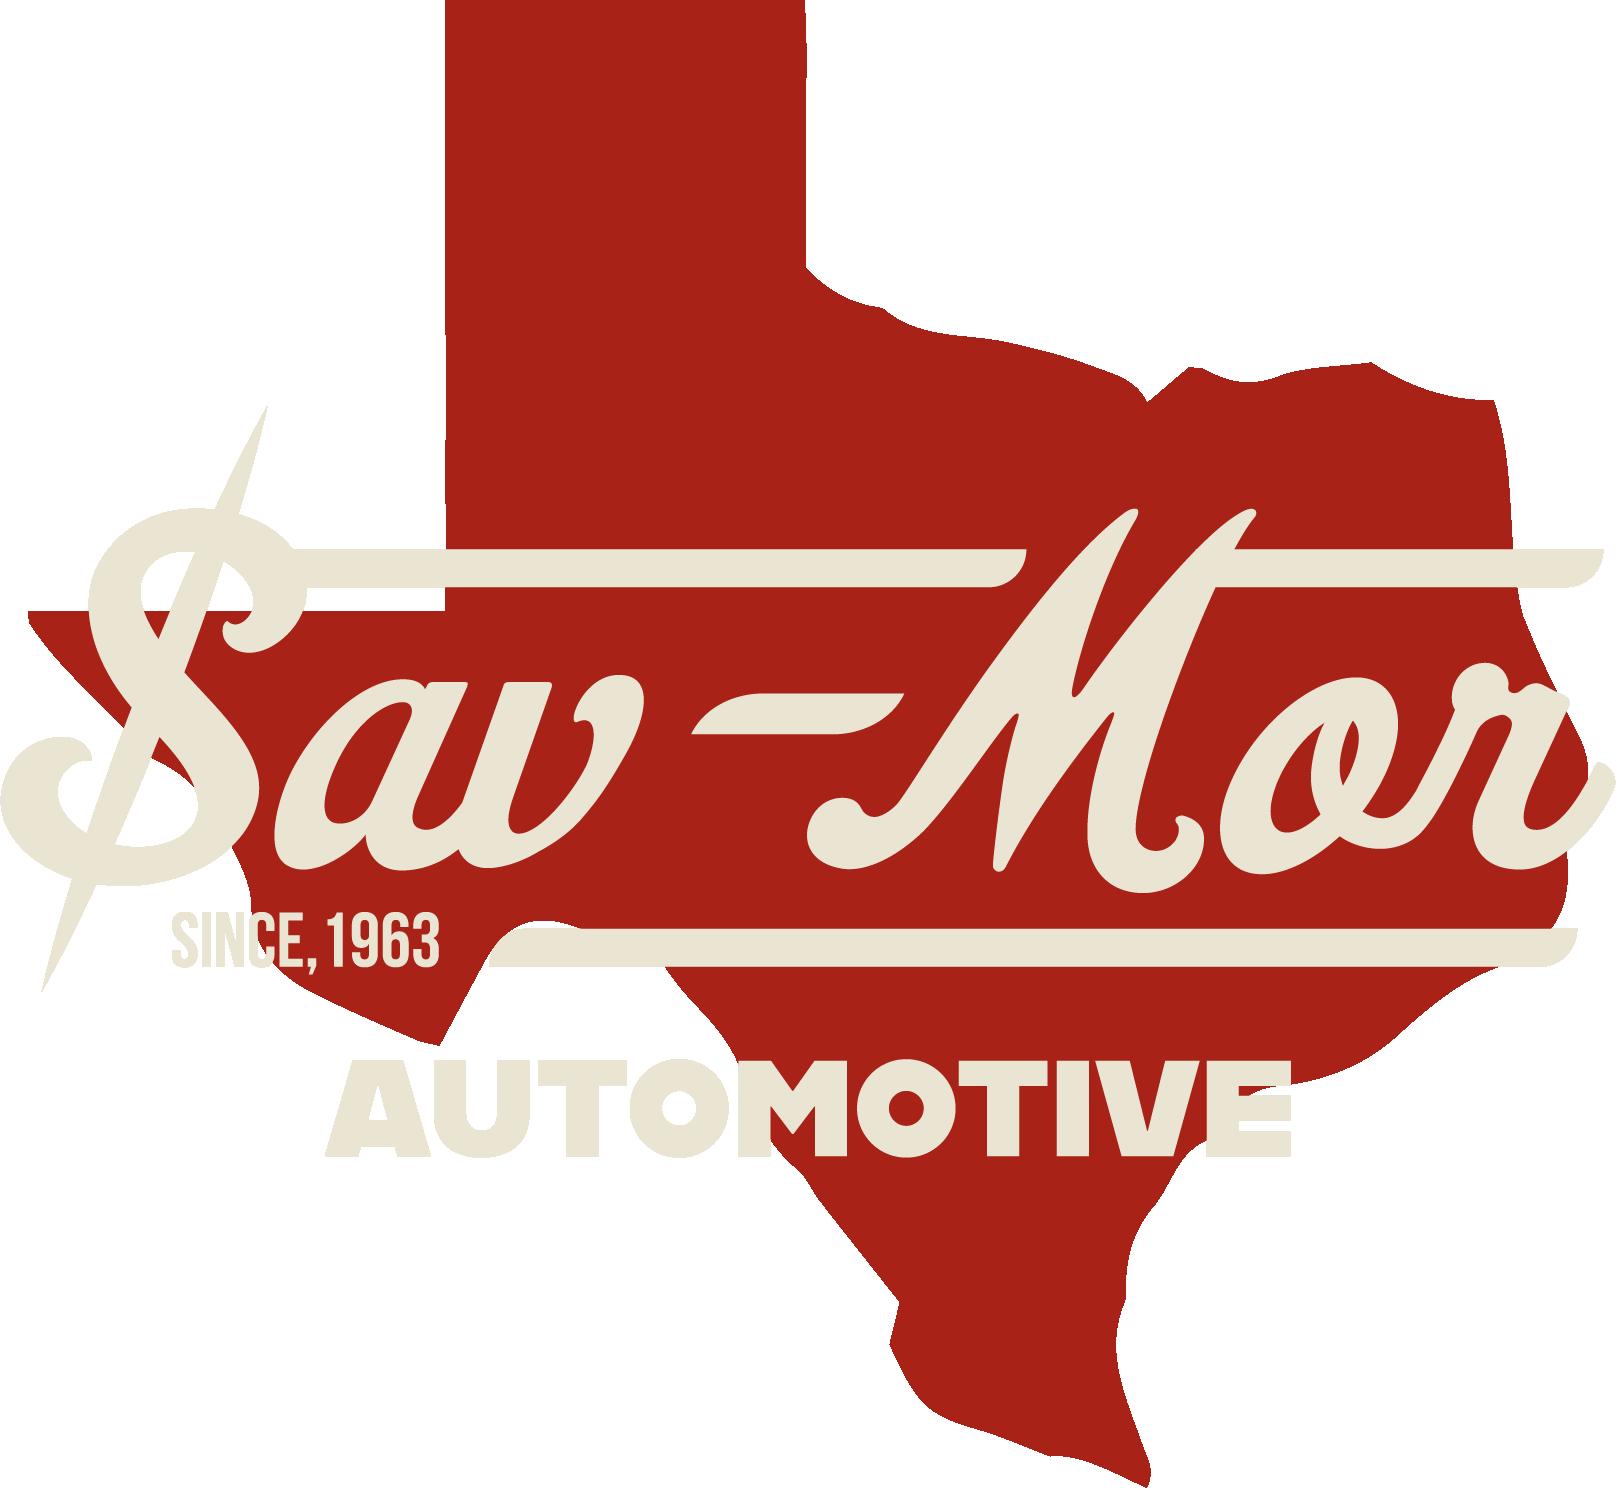 Sav-Mor Automotive